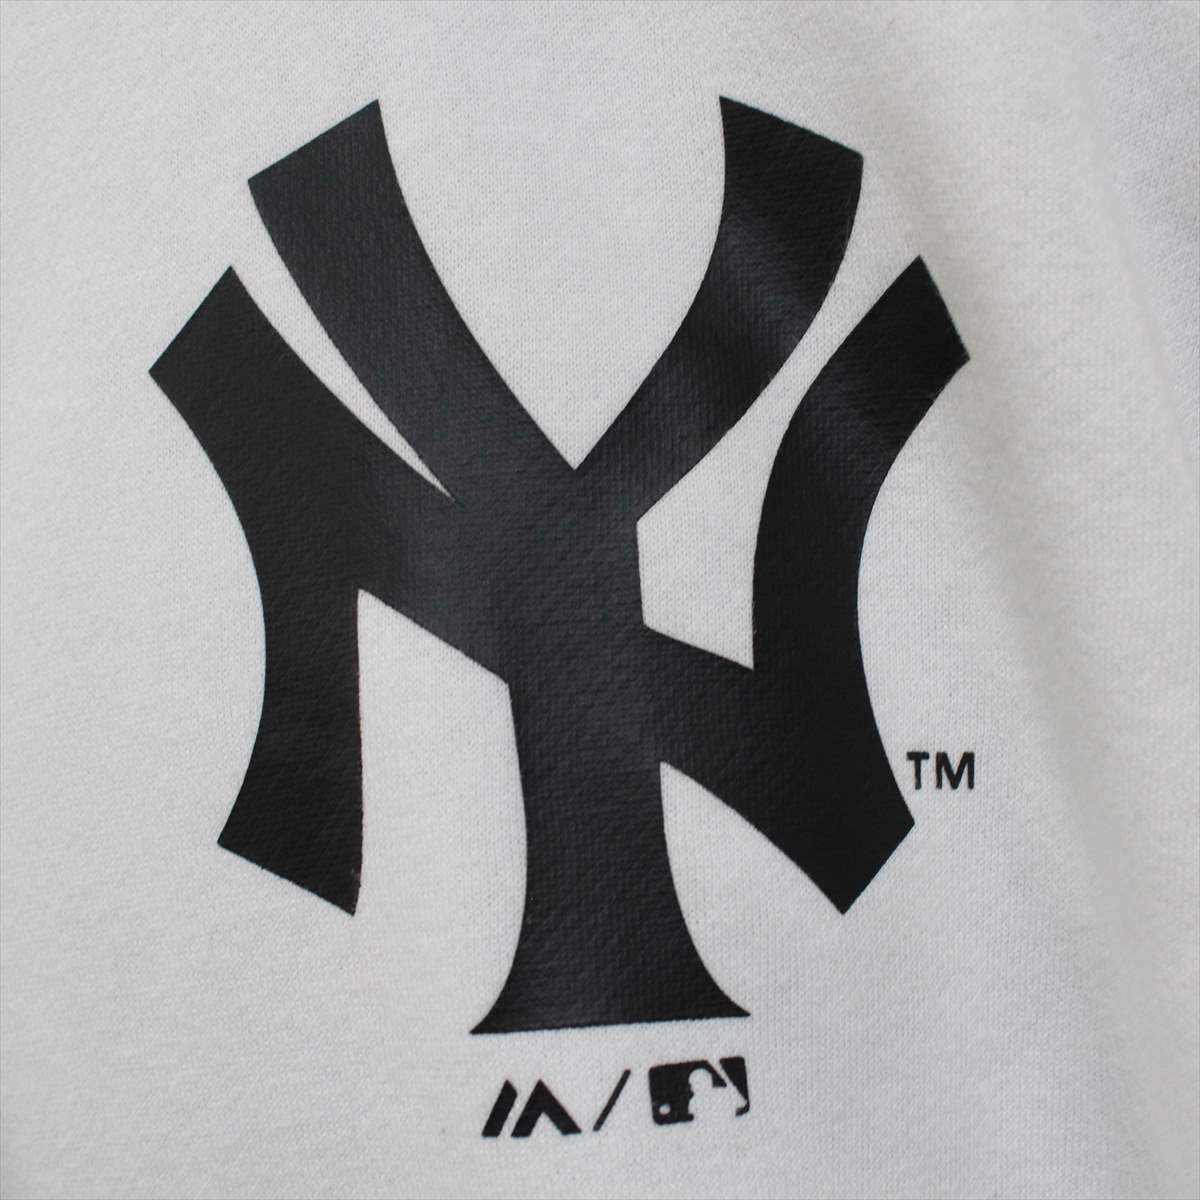 Majestic マジェスティック パーカー ホワイト Lサイズ 新品 白 ニューヨークヤンキース NEW YORK YANKEES フーディー プルオーバー_画像2